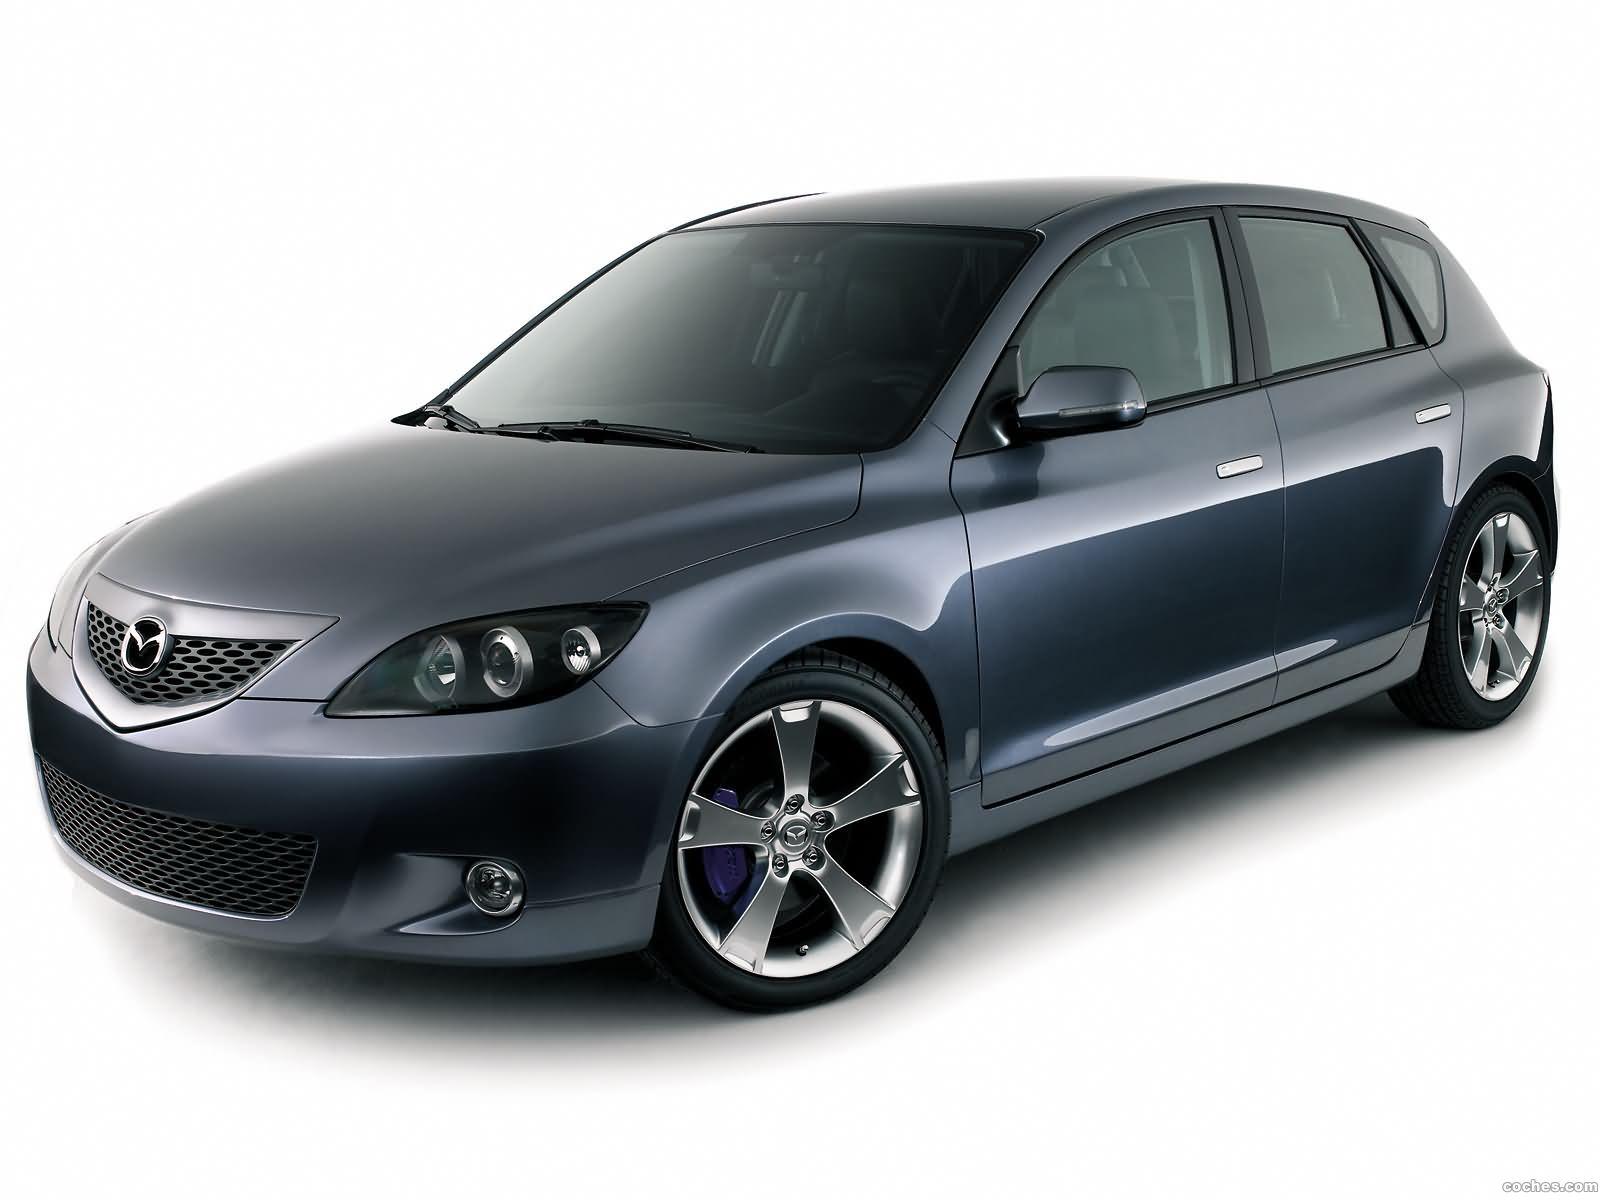 https://www.coches.com/fotos_historicas/mazda/MX-Sportif-Concept-2003/mazda__mx-sportif_m1.jpg